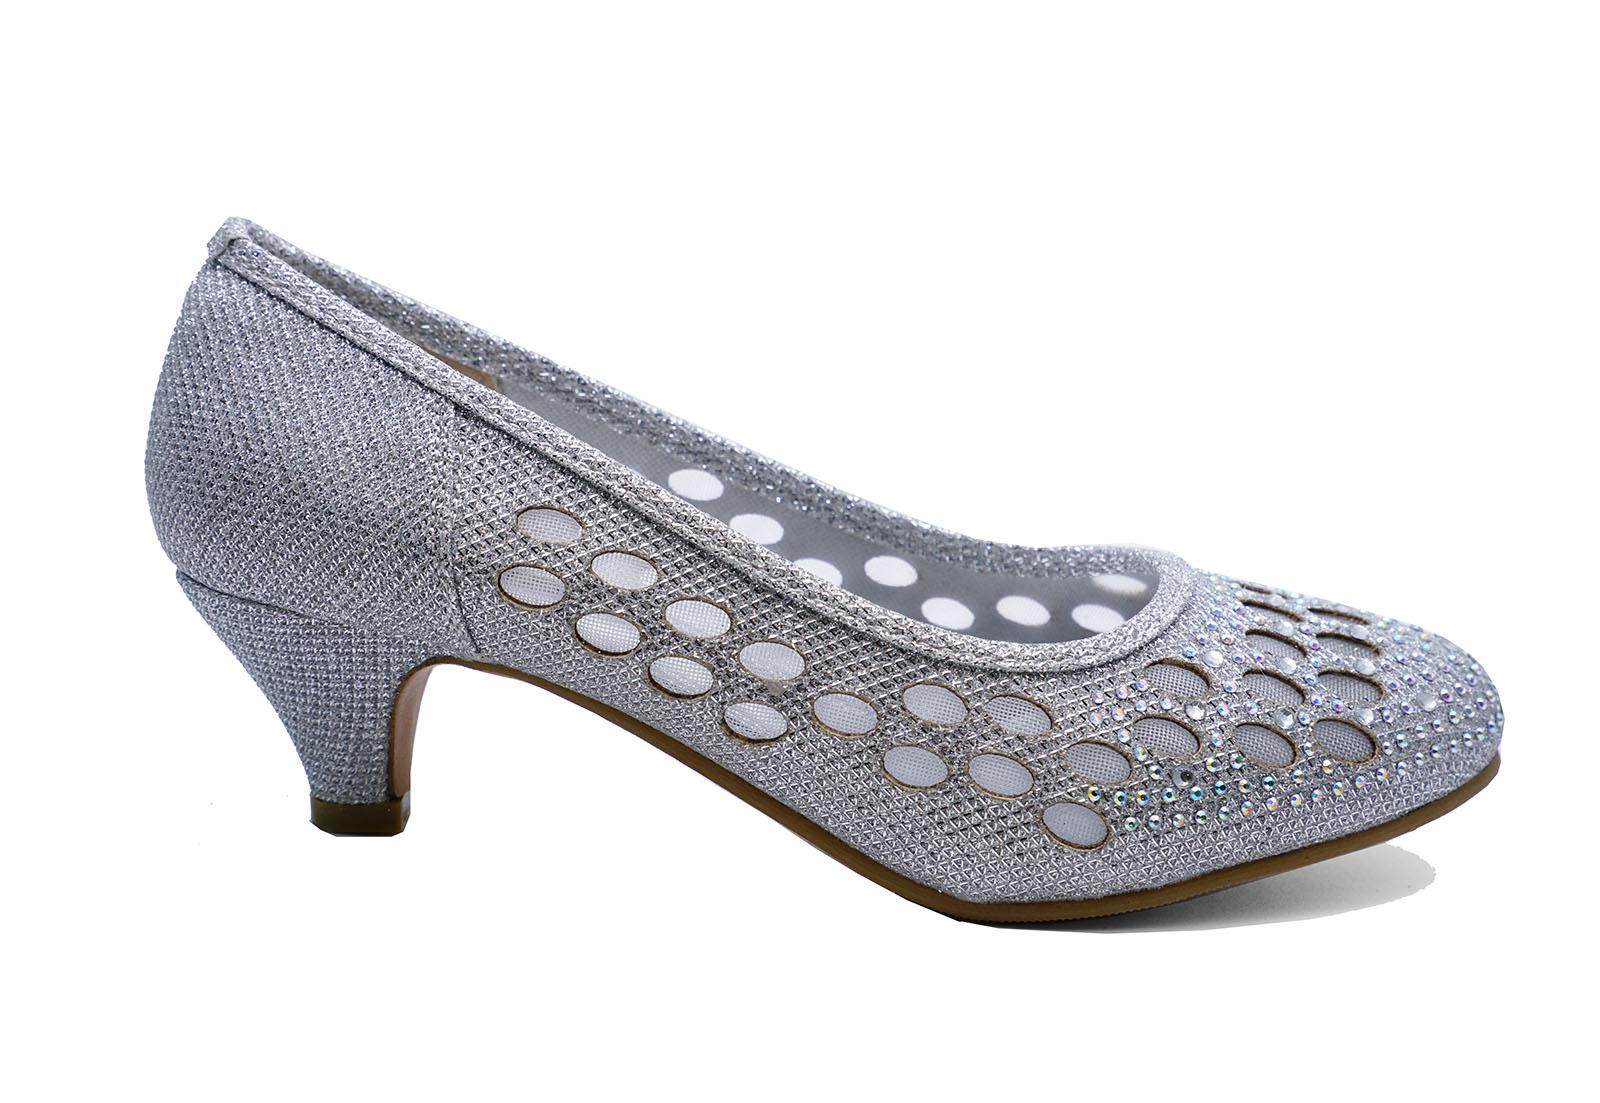 d6e78565ae2d Small Kitten Heel Shoes. LADIES SILVER WEDDING BRIDAL BRIDESMAID PROM  DIAMANTE KITTEN HEEL .